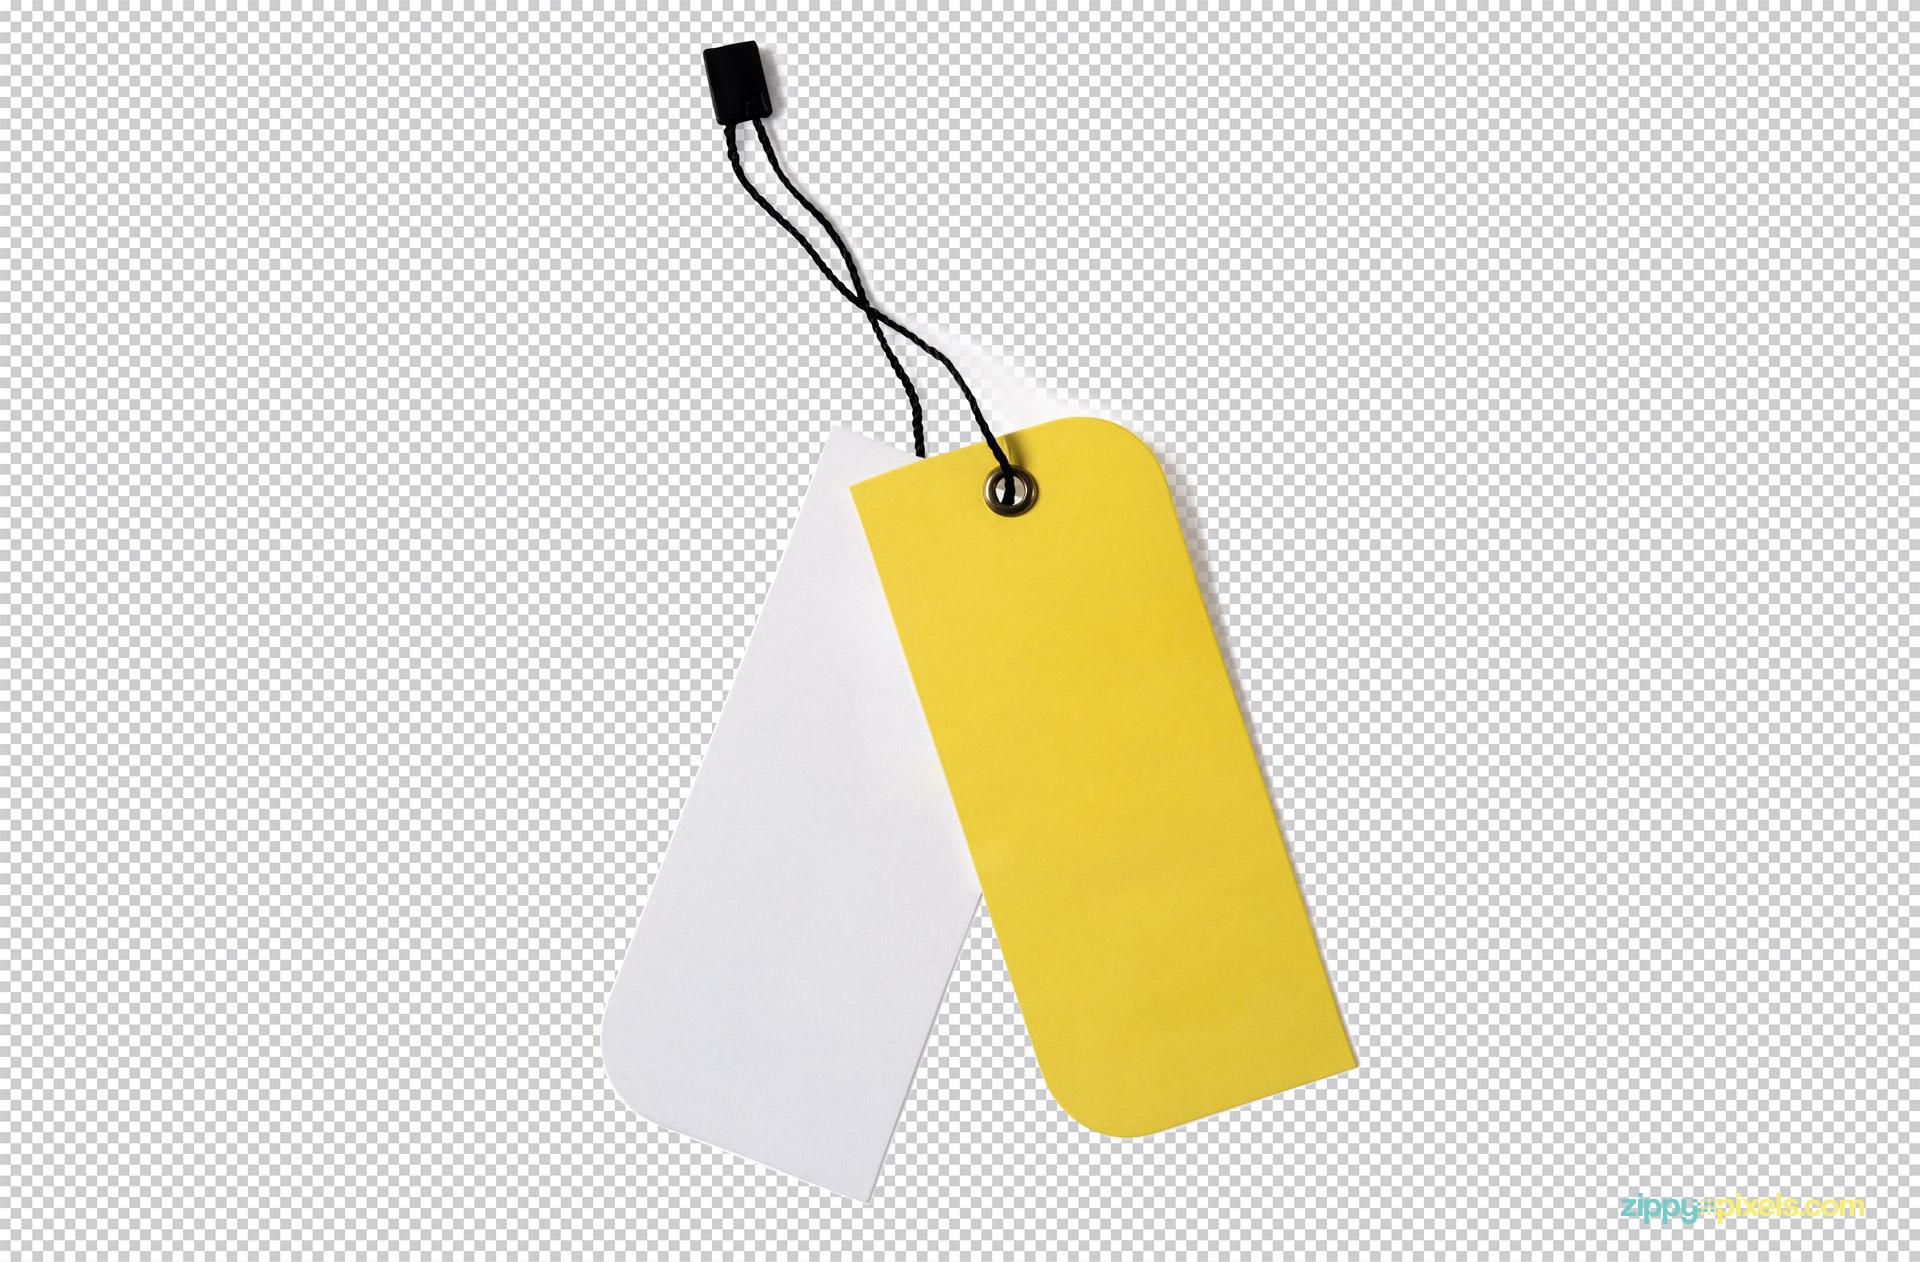 Customize clothing tag PSD mockup.